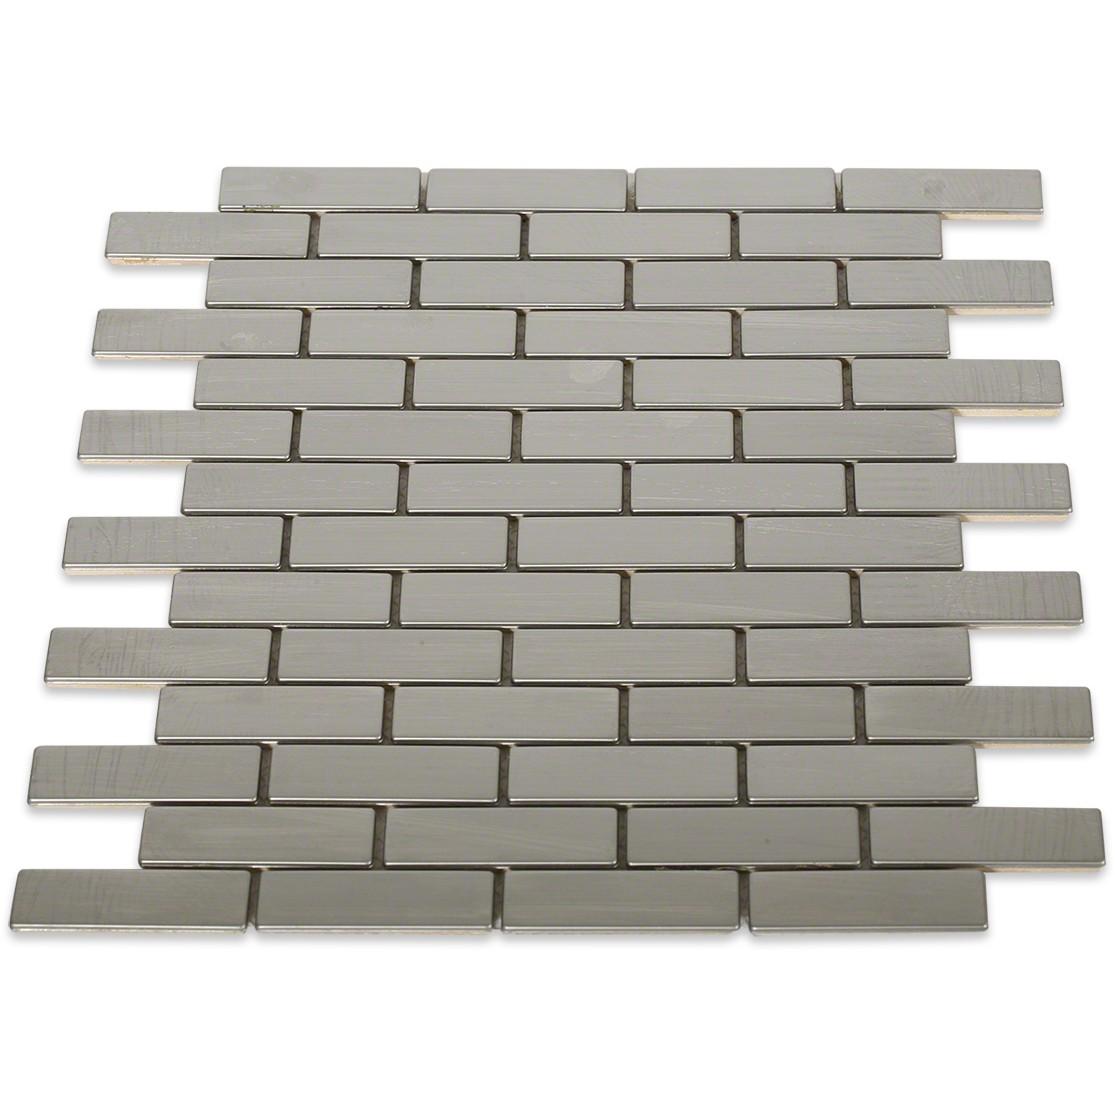 Stainless Steel Bricks : Shop for stainless steel metal tile brick pattern